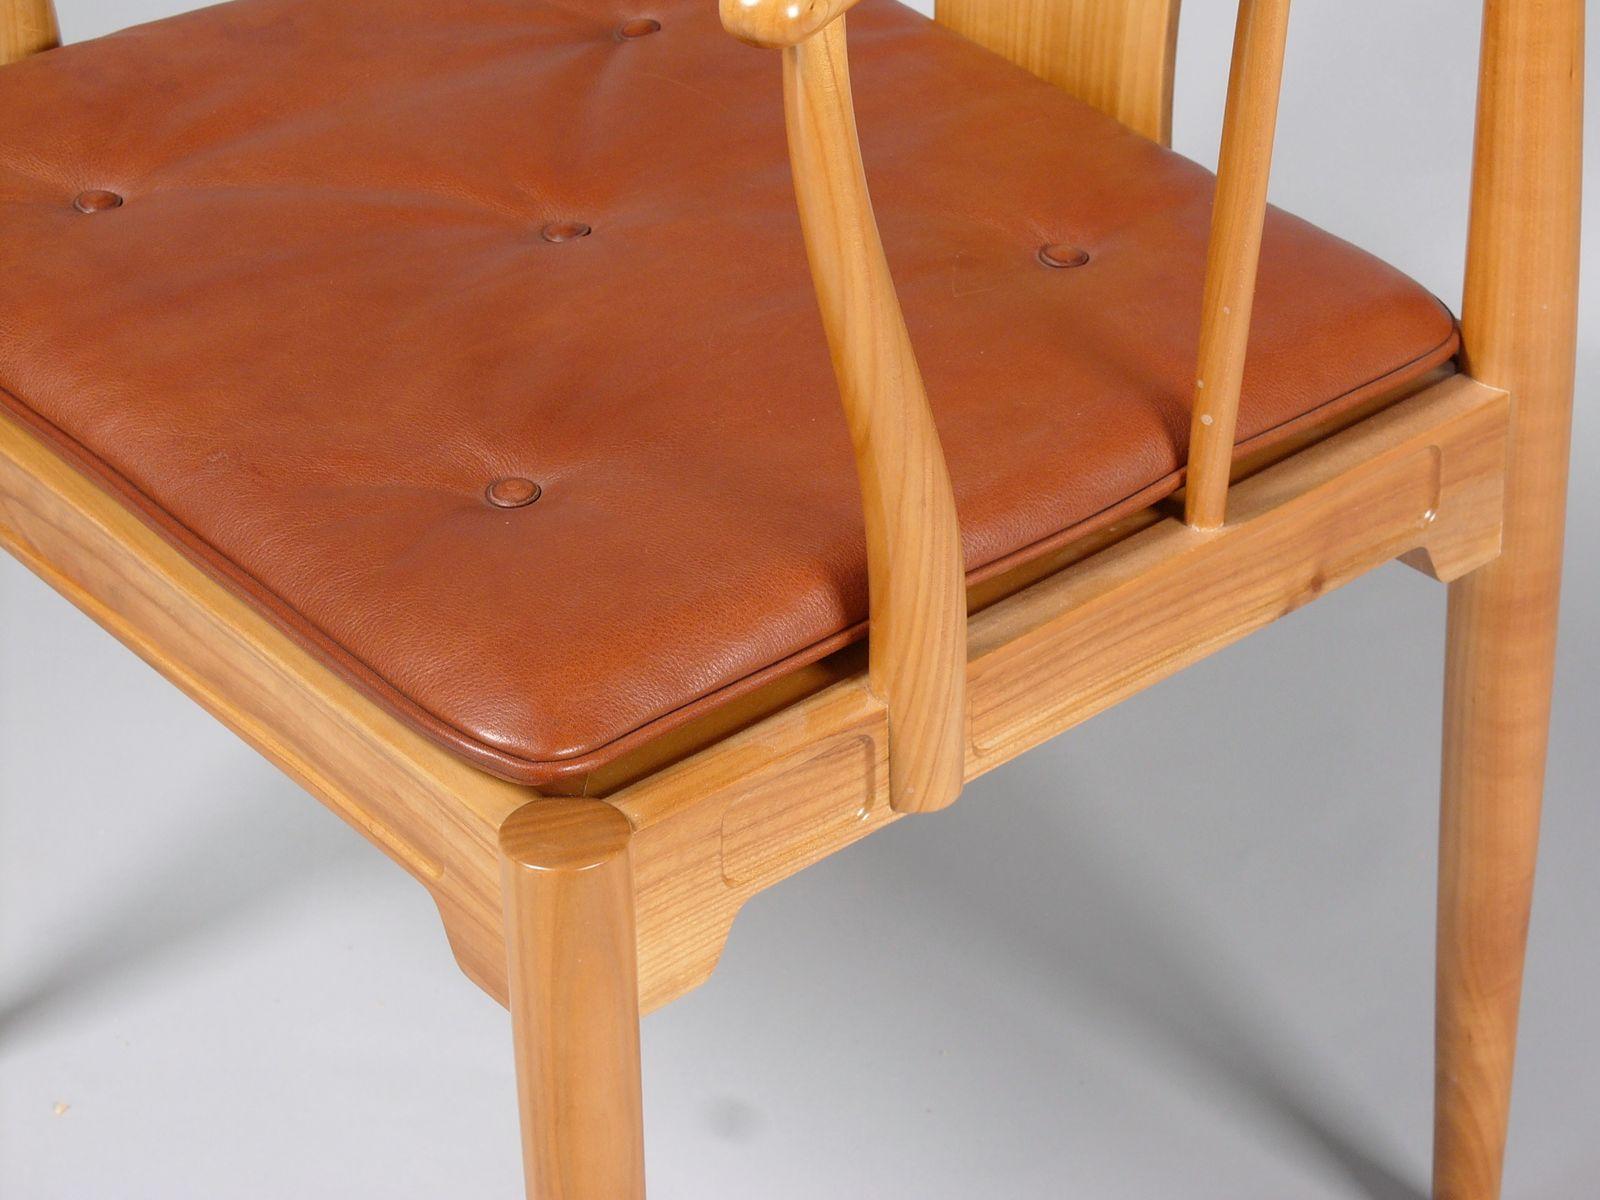 modell fh 4283 china stuhl aus kirschholz von hans j wegner f r fritz hansen 1983 bei pamono. Black Bedroom Furniture Sets. Home Design Ideas